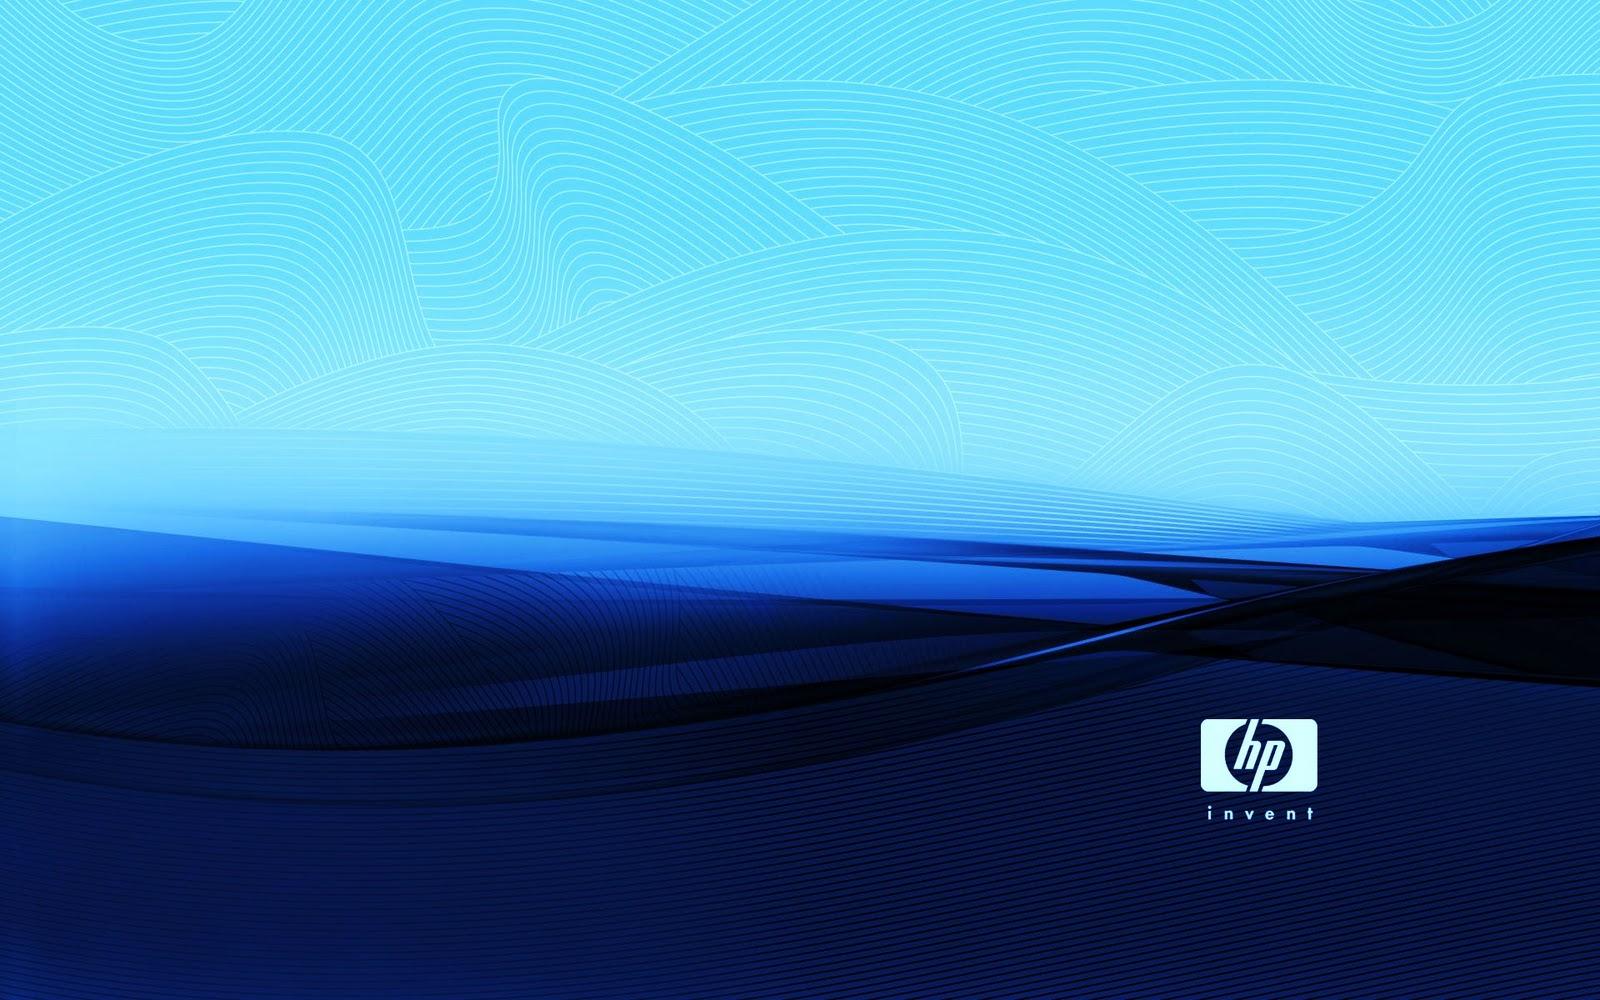 hp laptop wallpaper 26 hp laptop wallpaper 27 hp laptop wallpaper 28 1600x1000